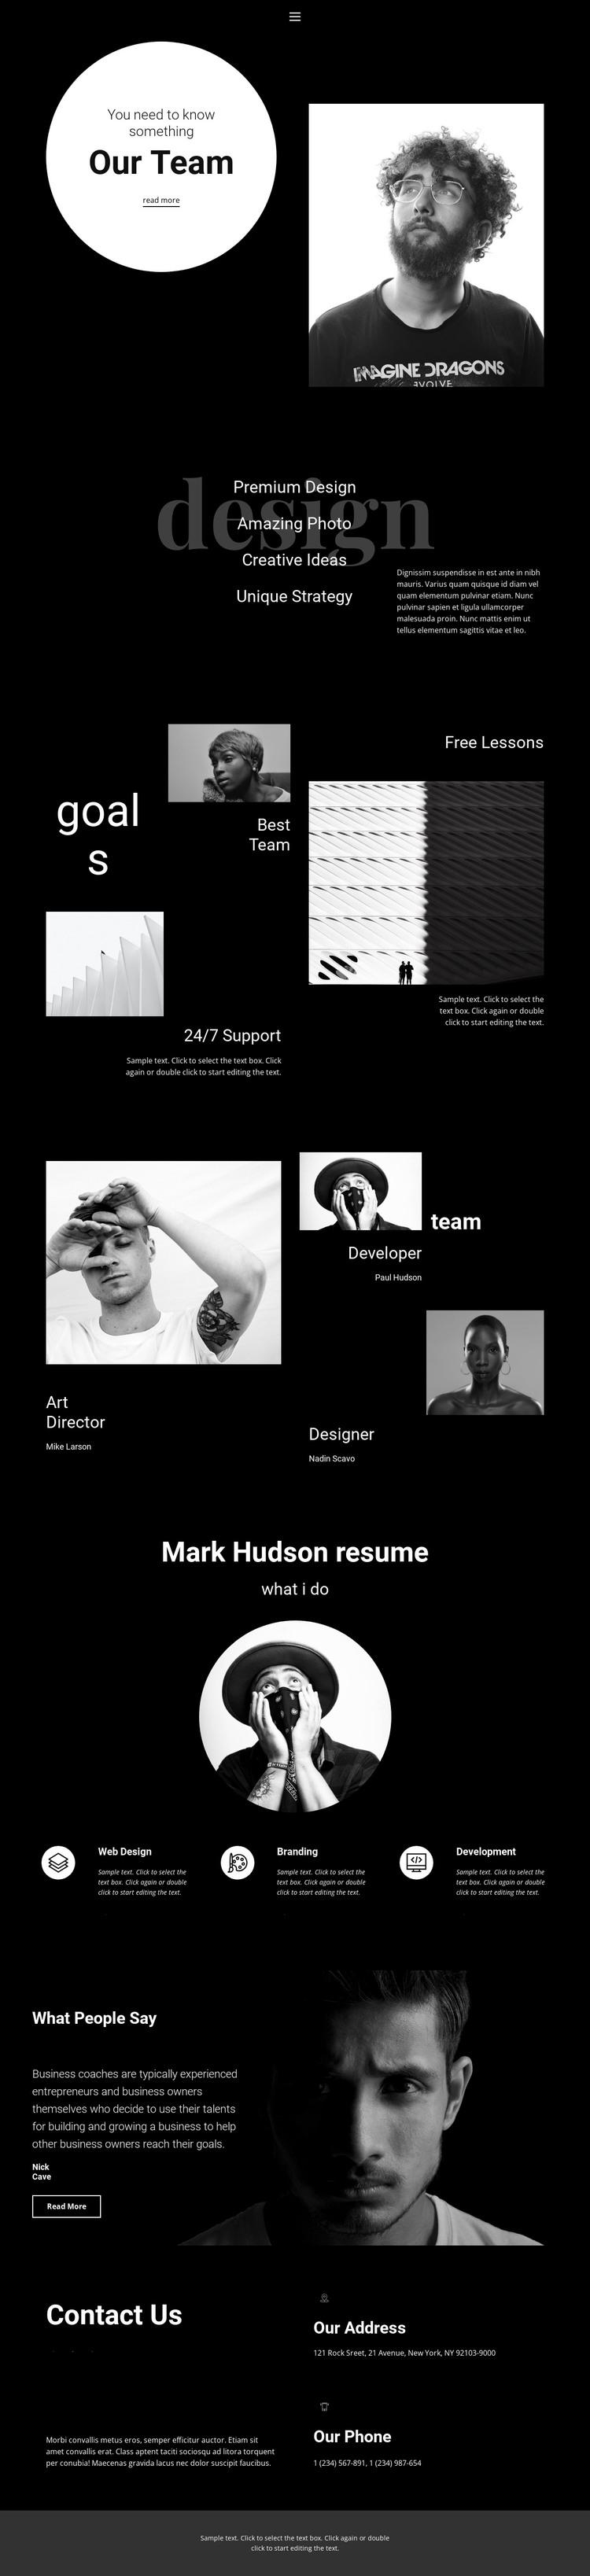 Design and development team Web Design